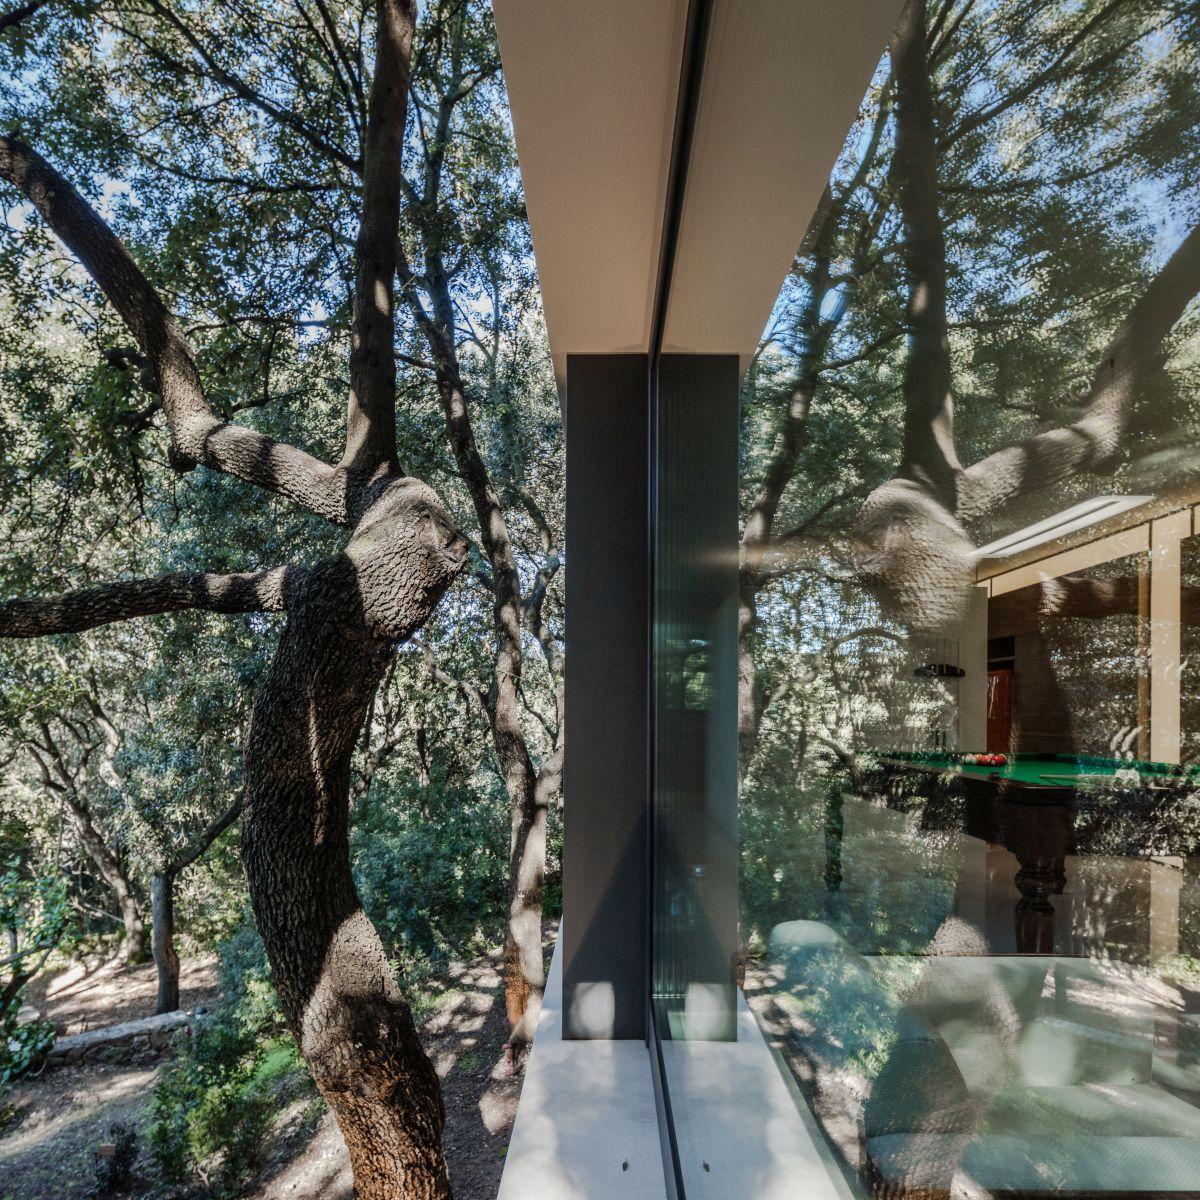 Casa nel Bosco indoor outdoor boundary